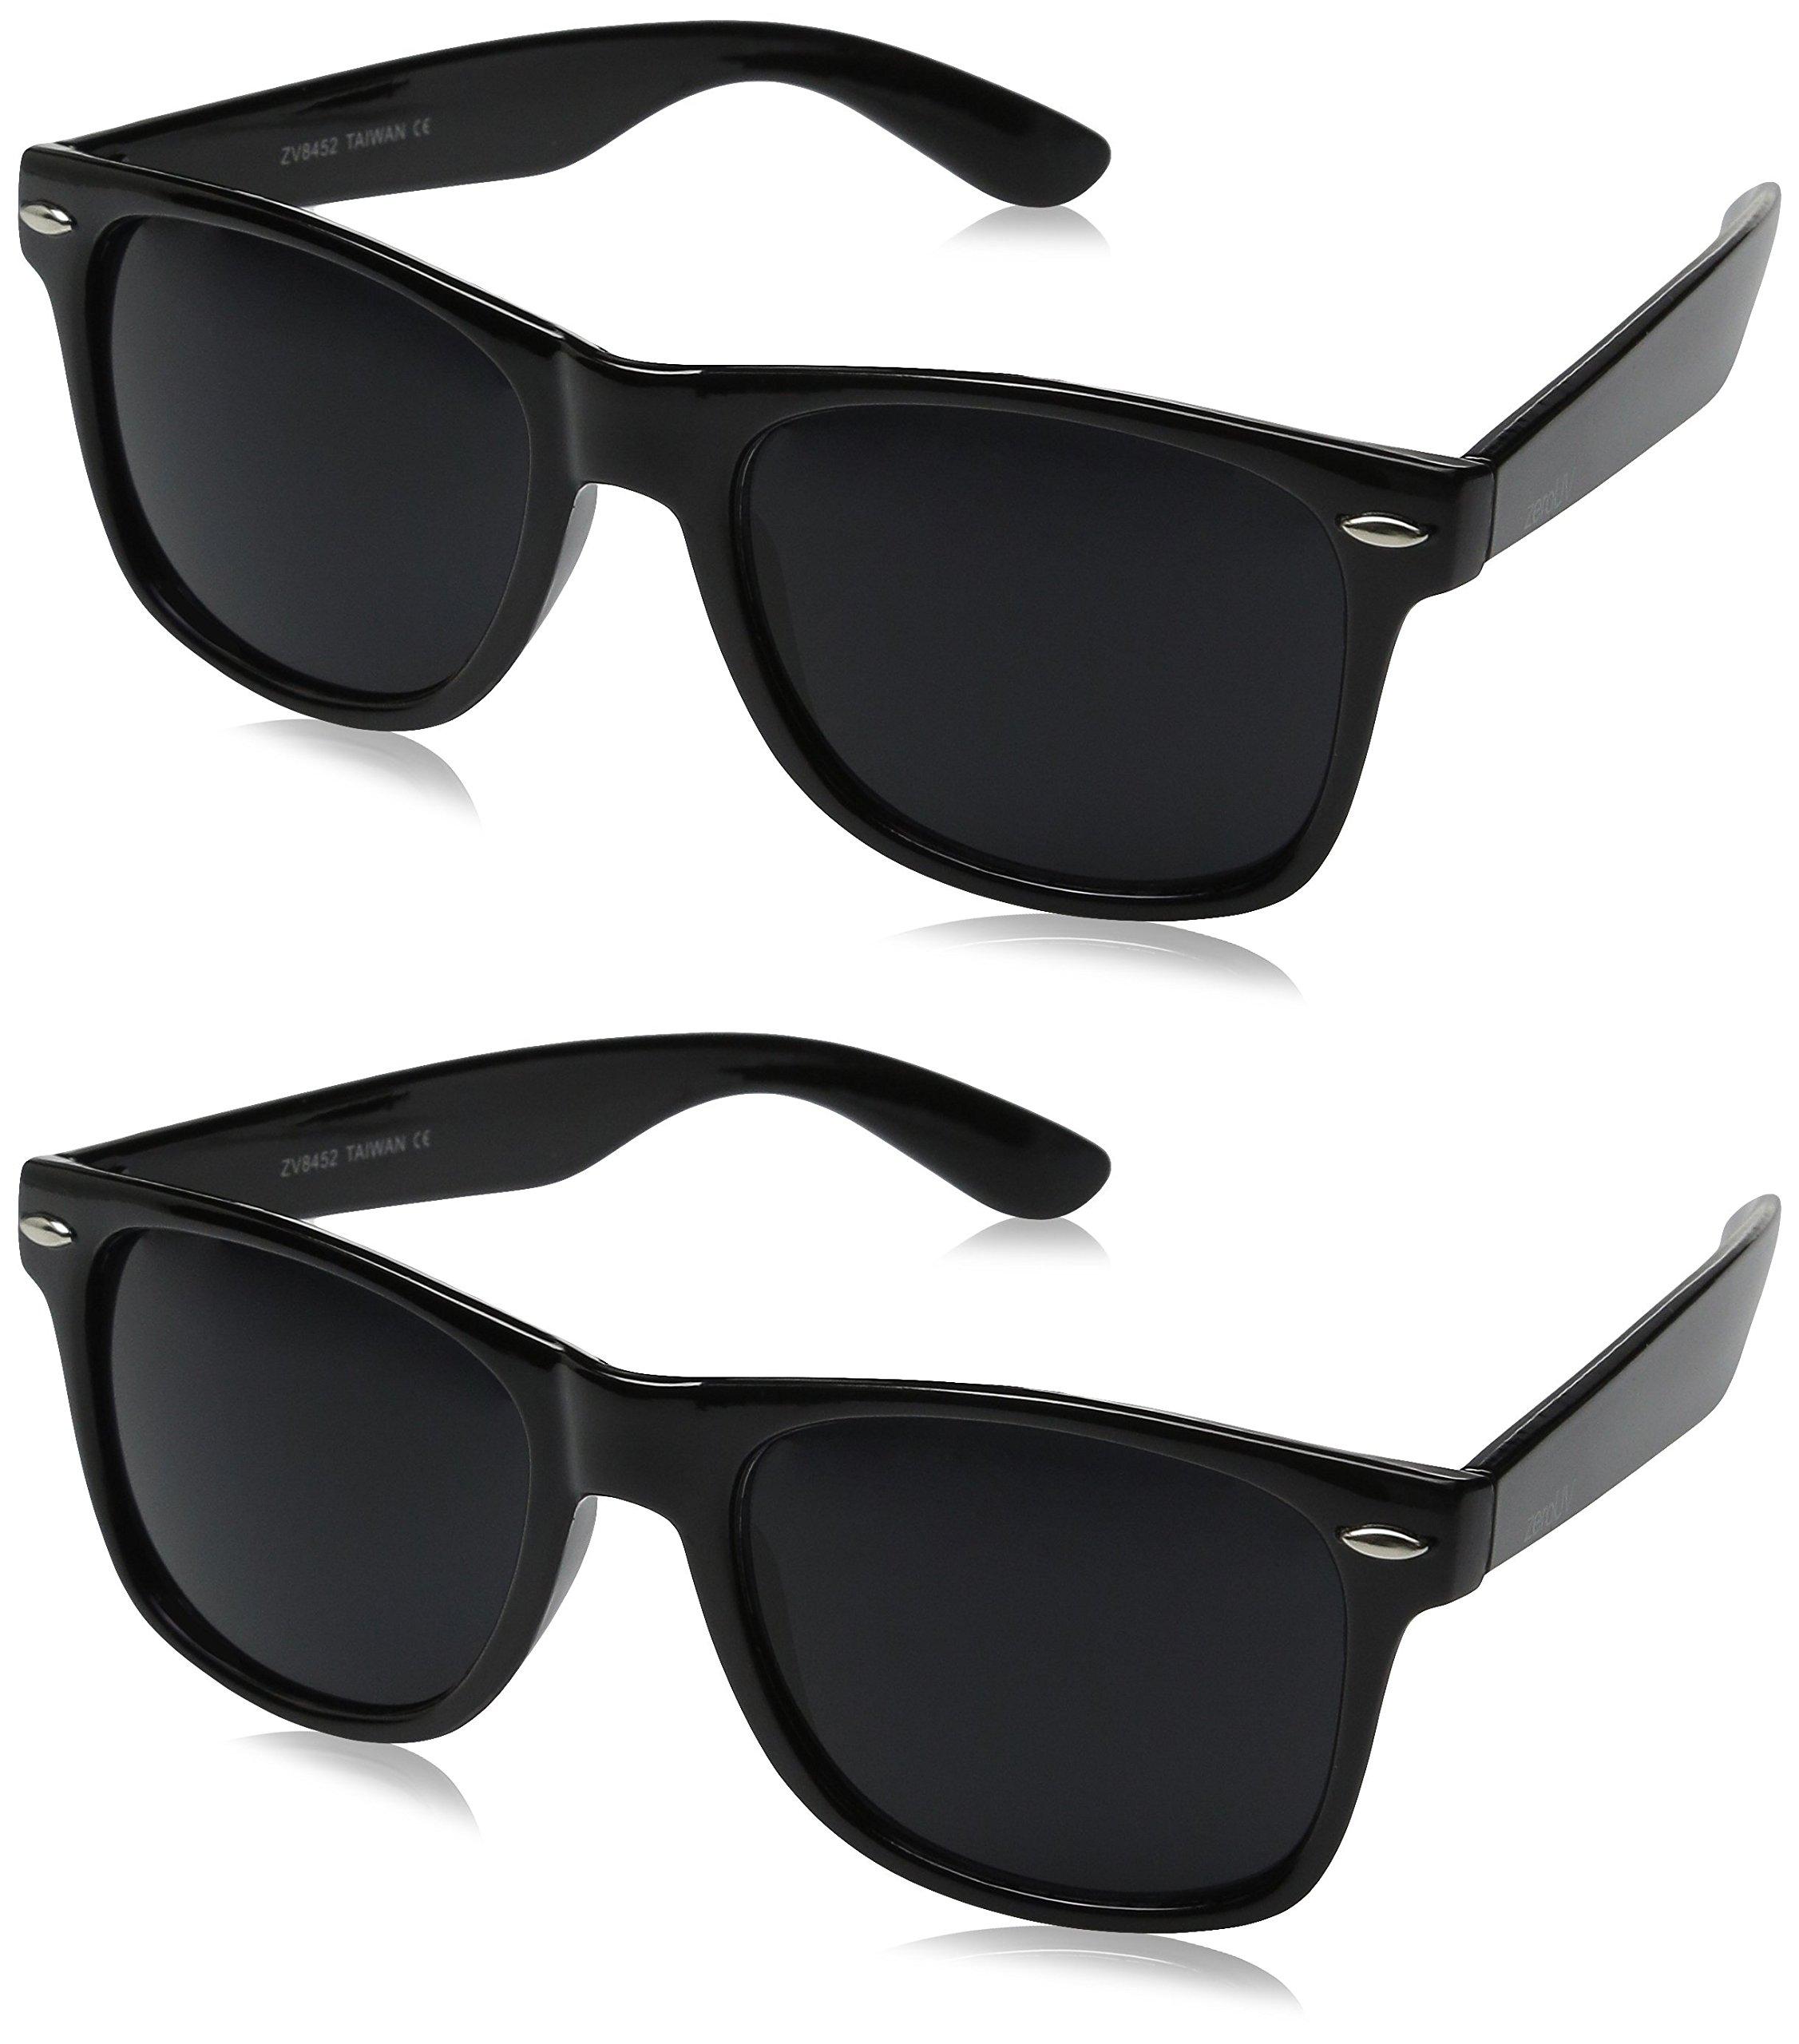 zeroUV ZV-8452ee Wayfarer Sunglasses (Two Pack)